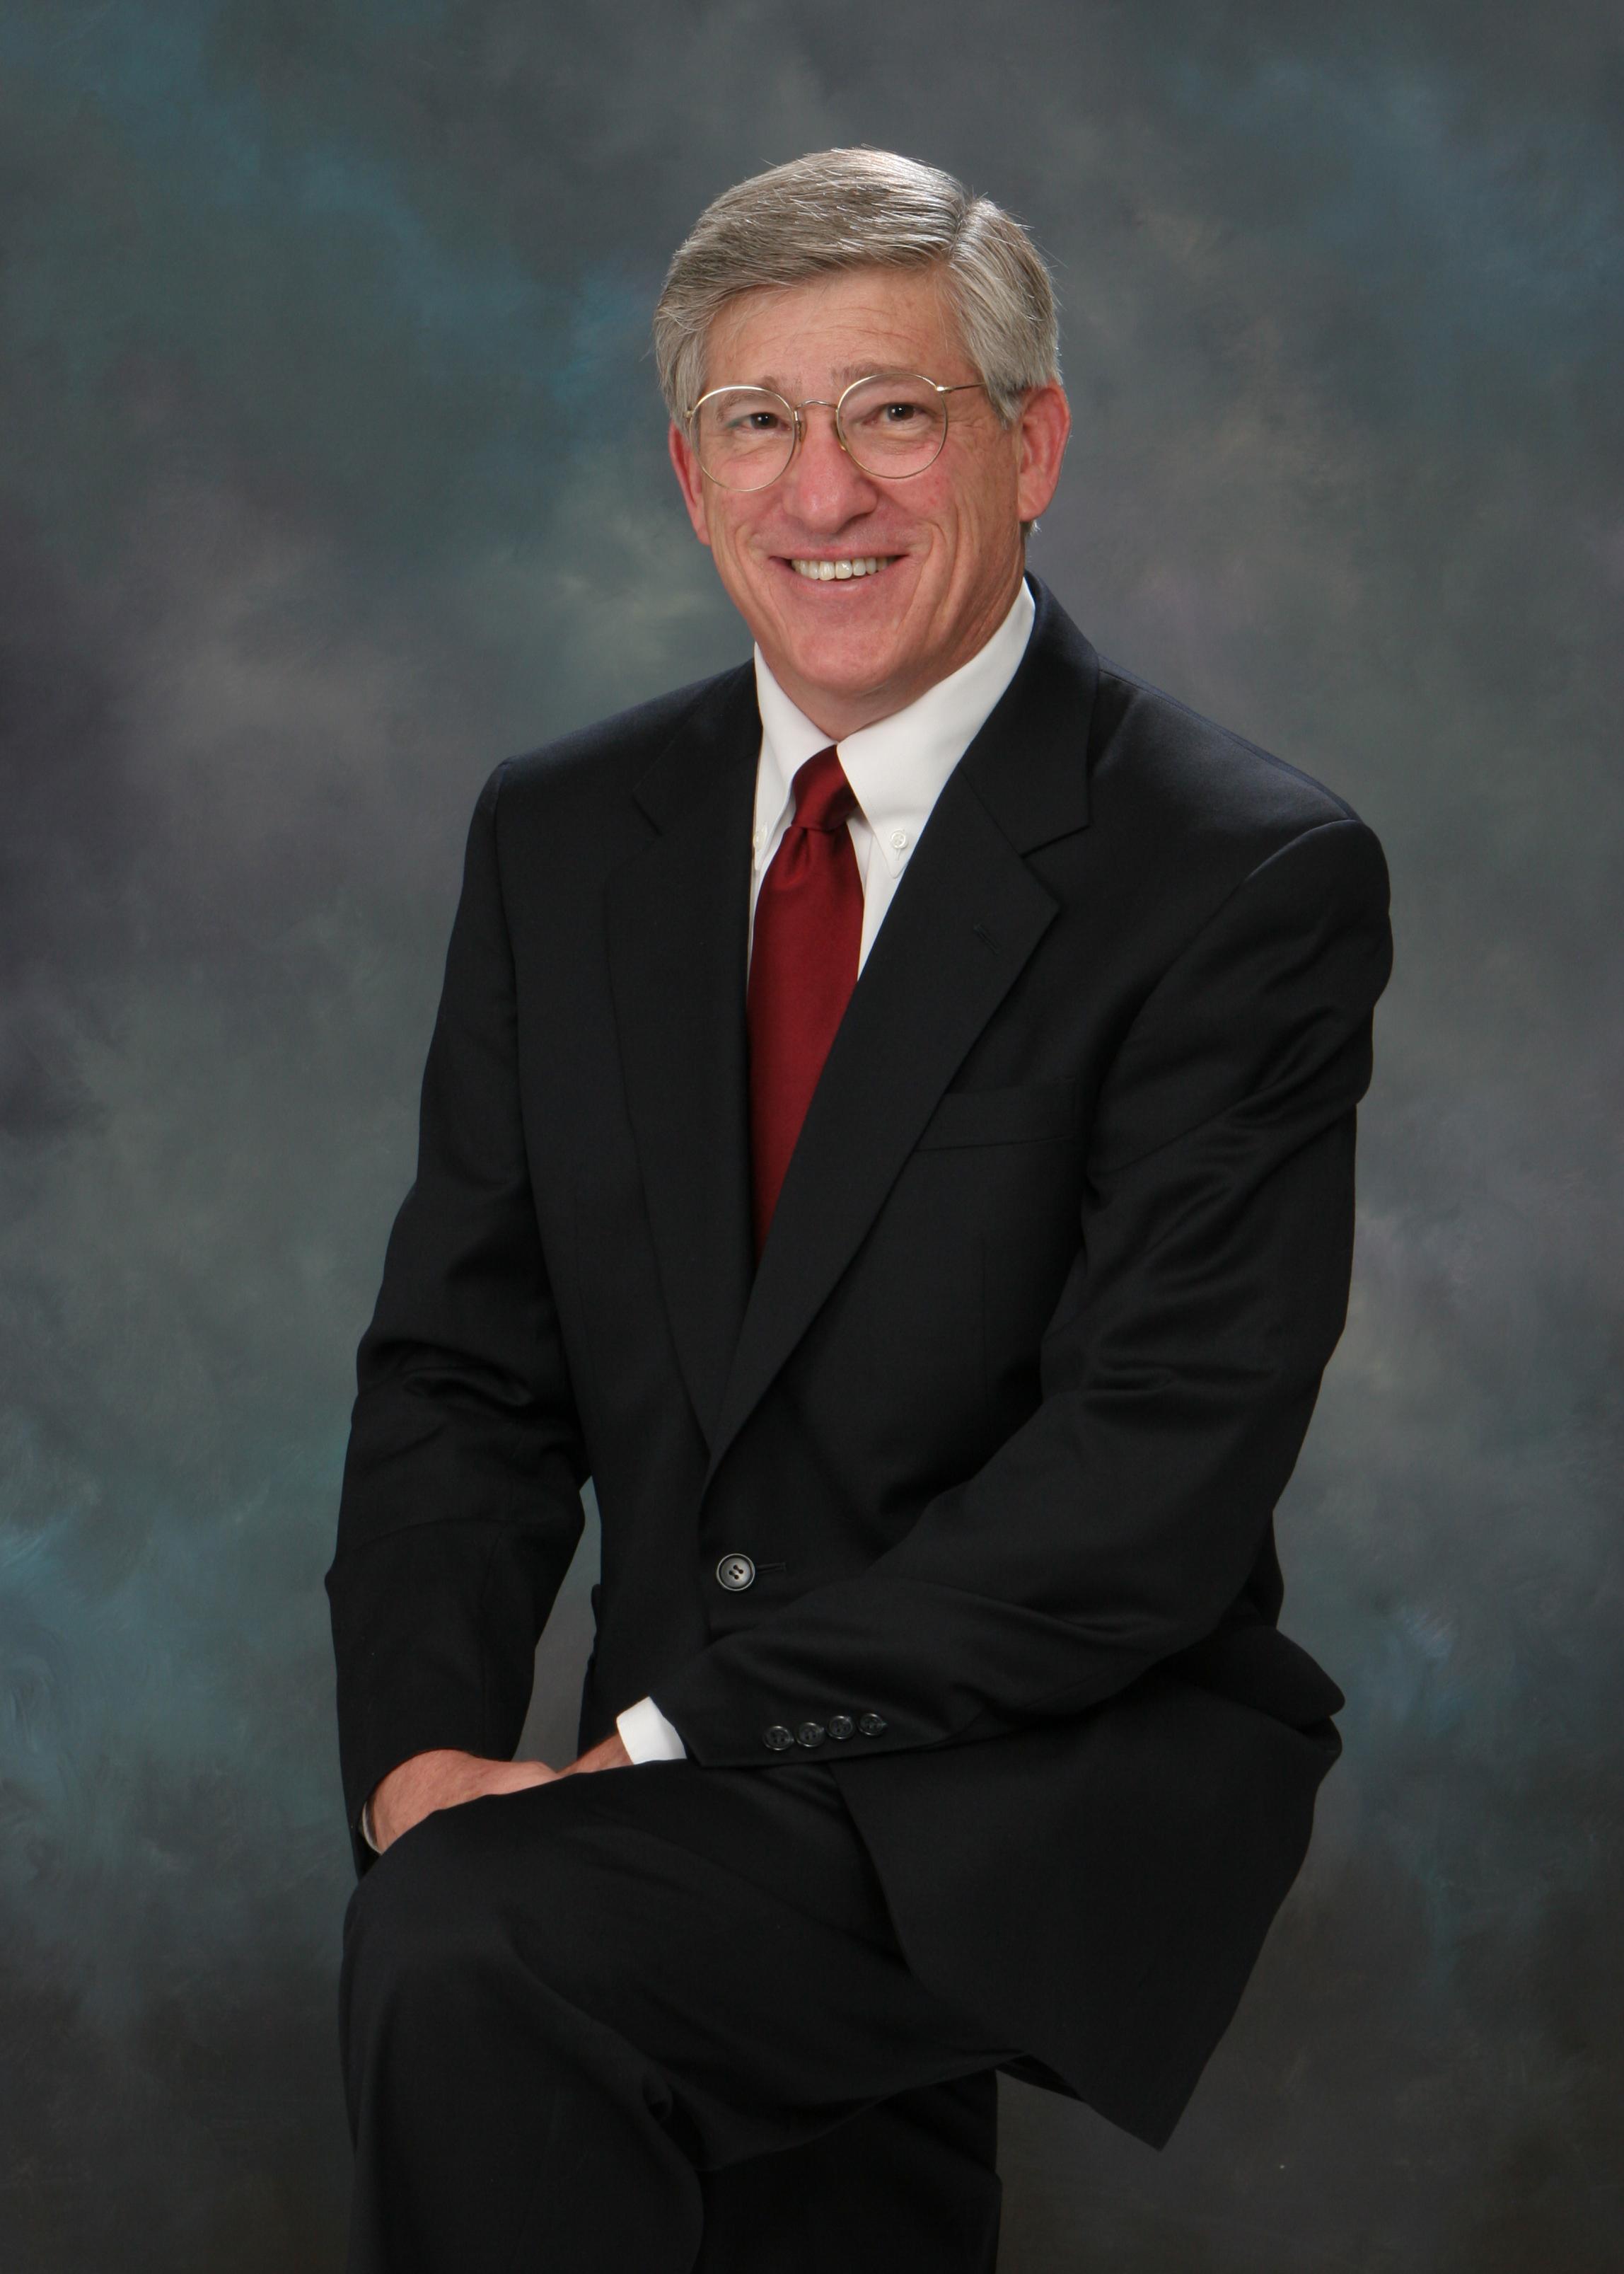 Rabbi Joel Schwartzman